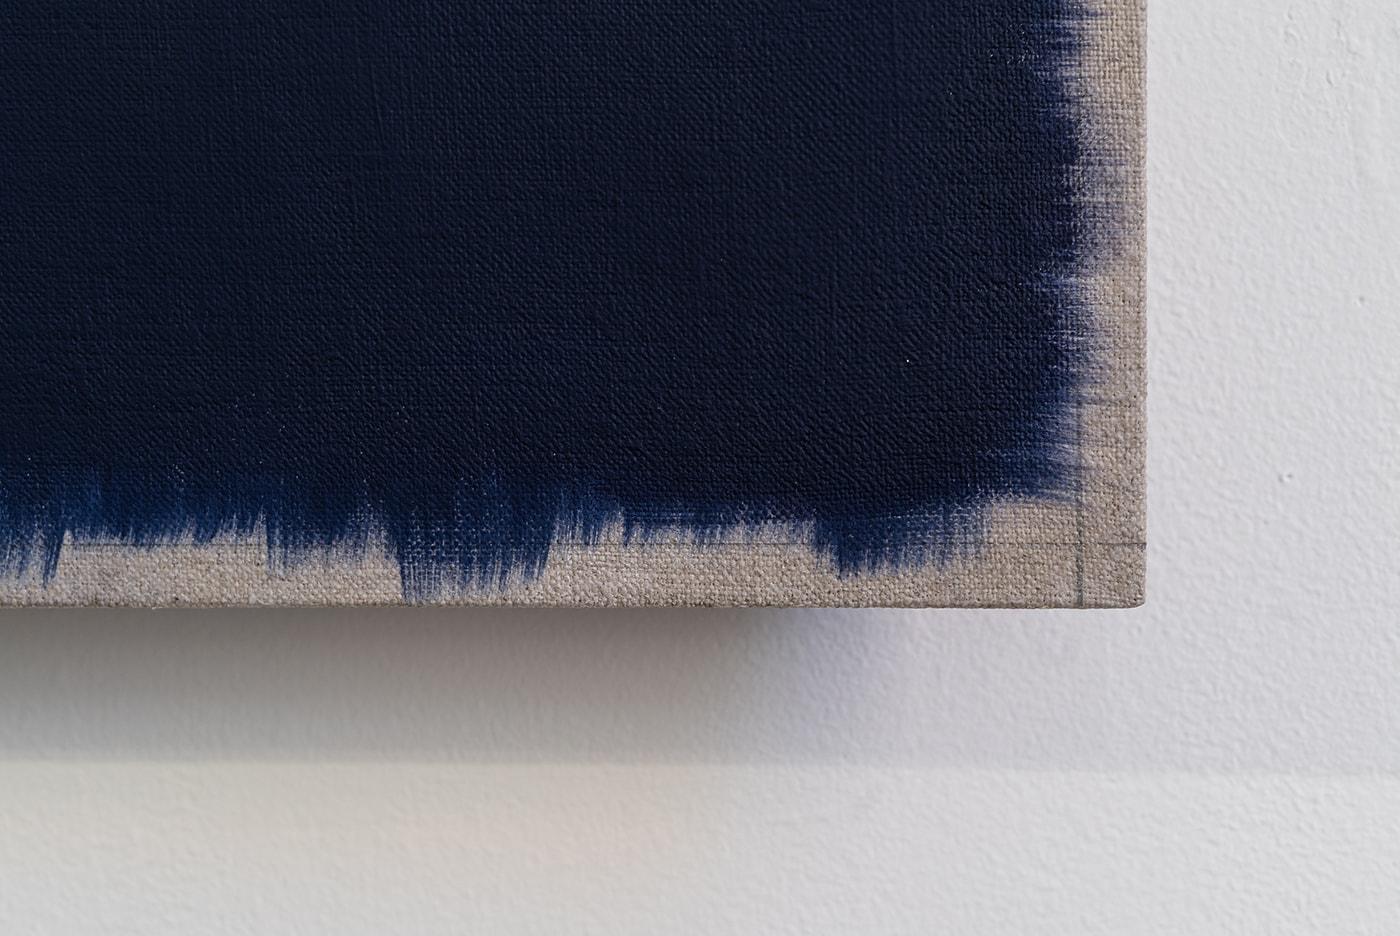 Randy Gibson : Rational Wedge 81:56 (Blue)